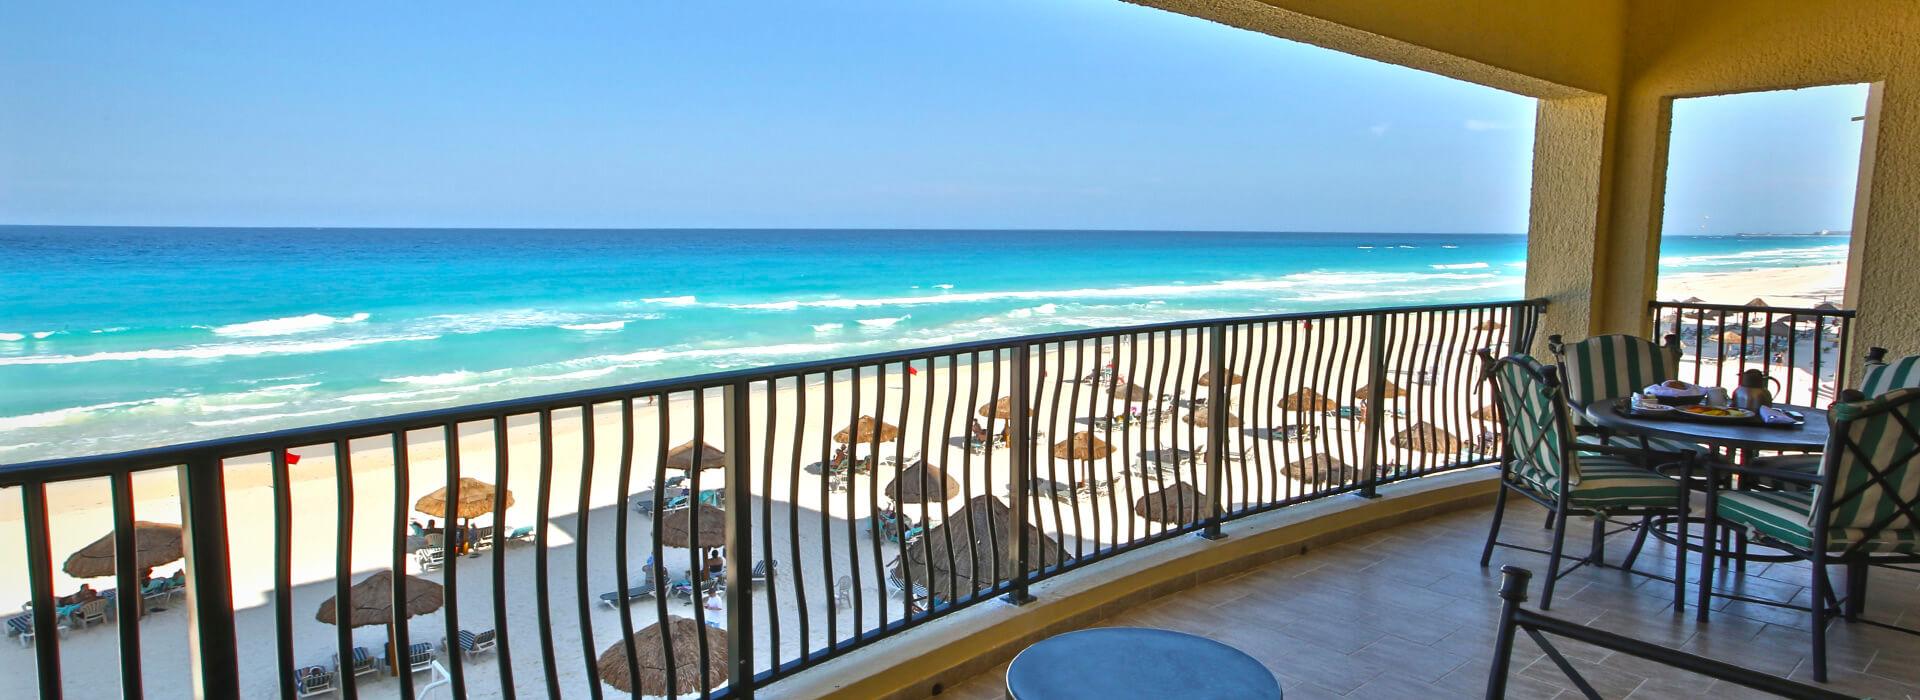 Cancun beachfront all inclusive resort